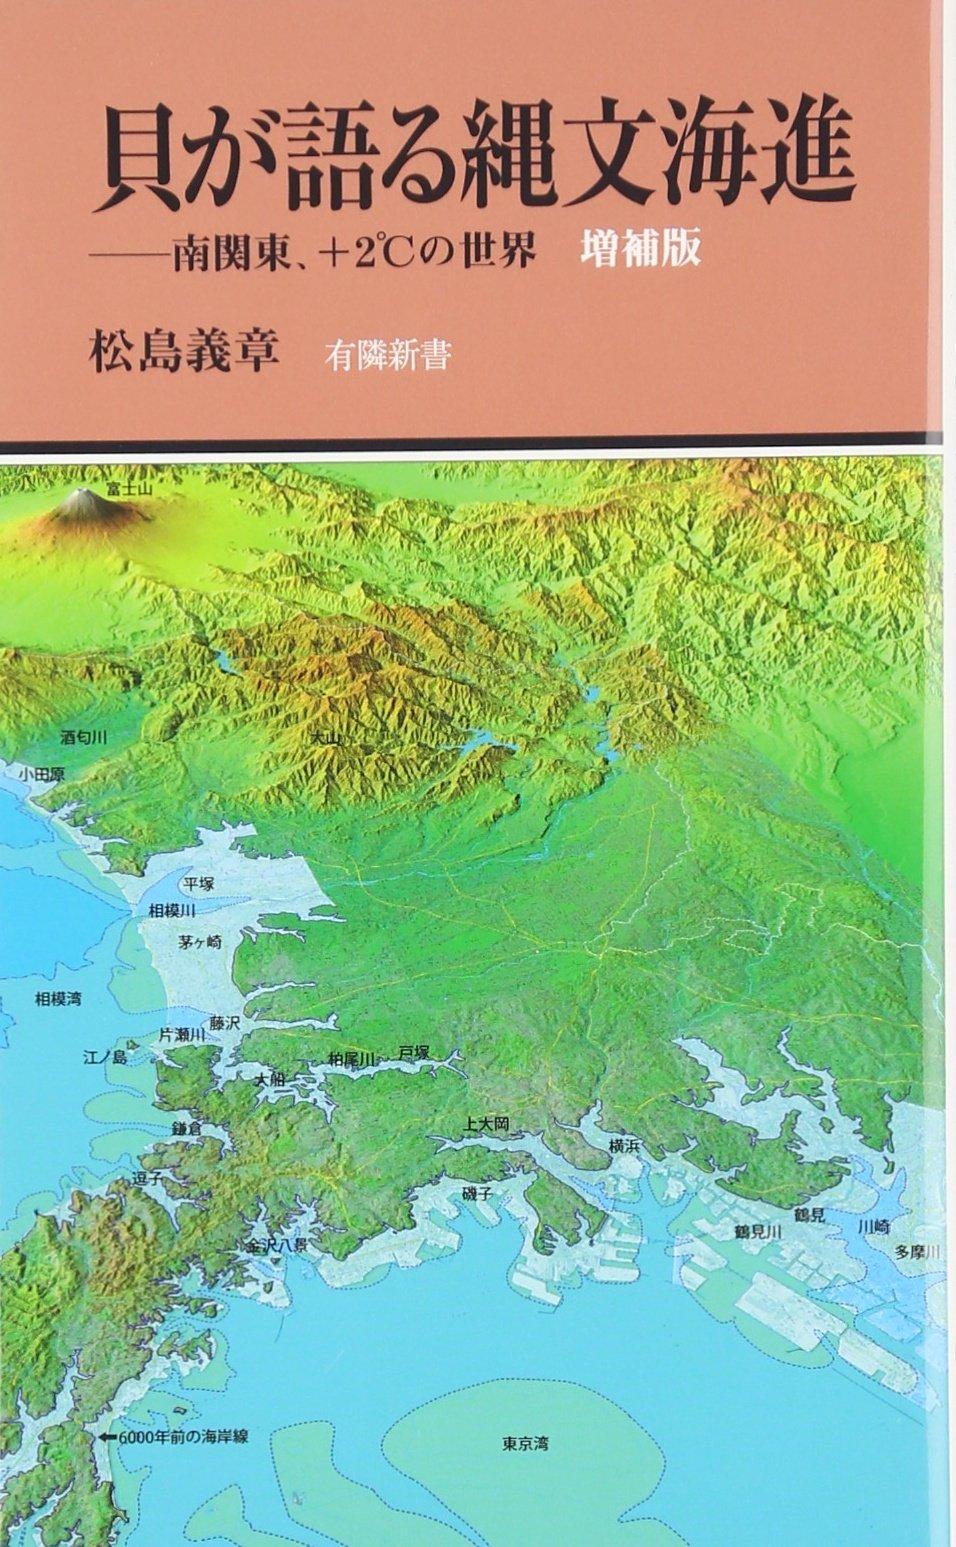 進 地図 海 縄文